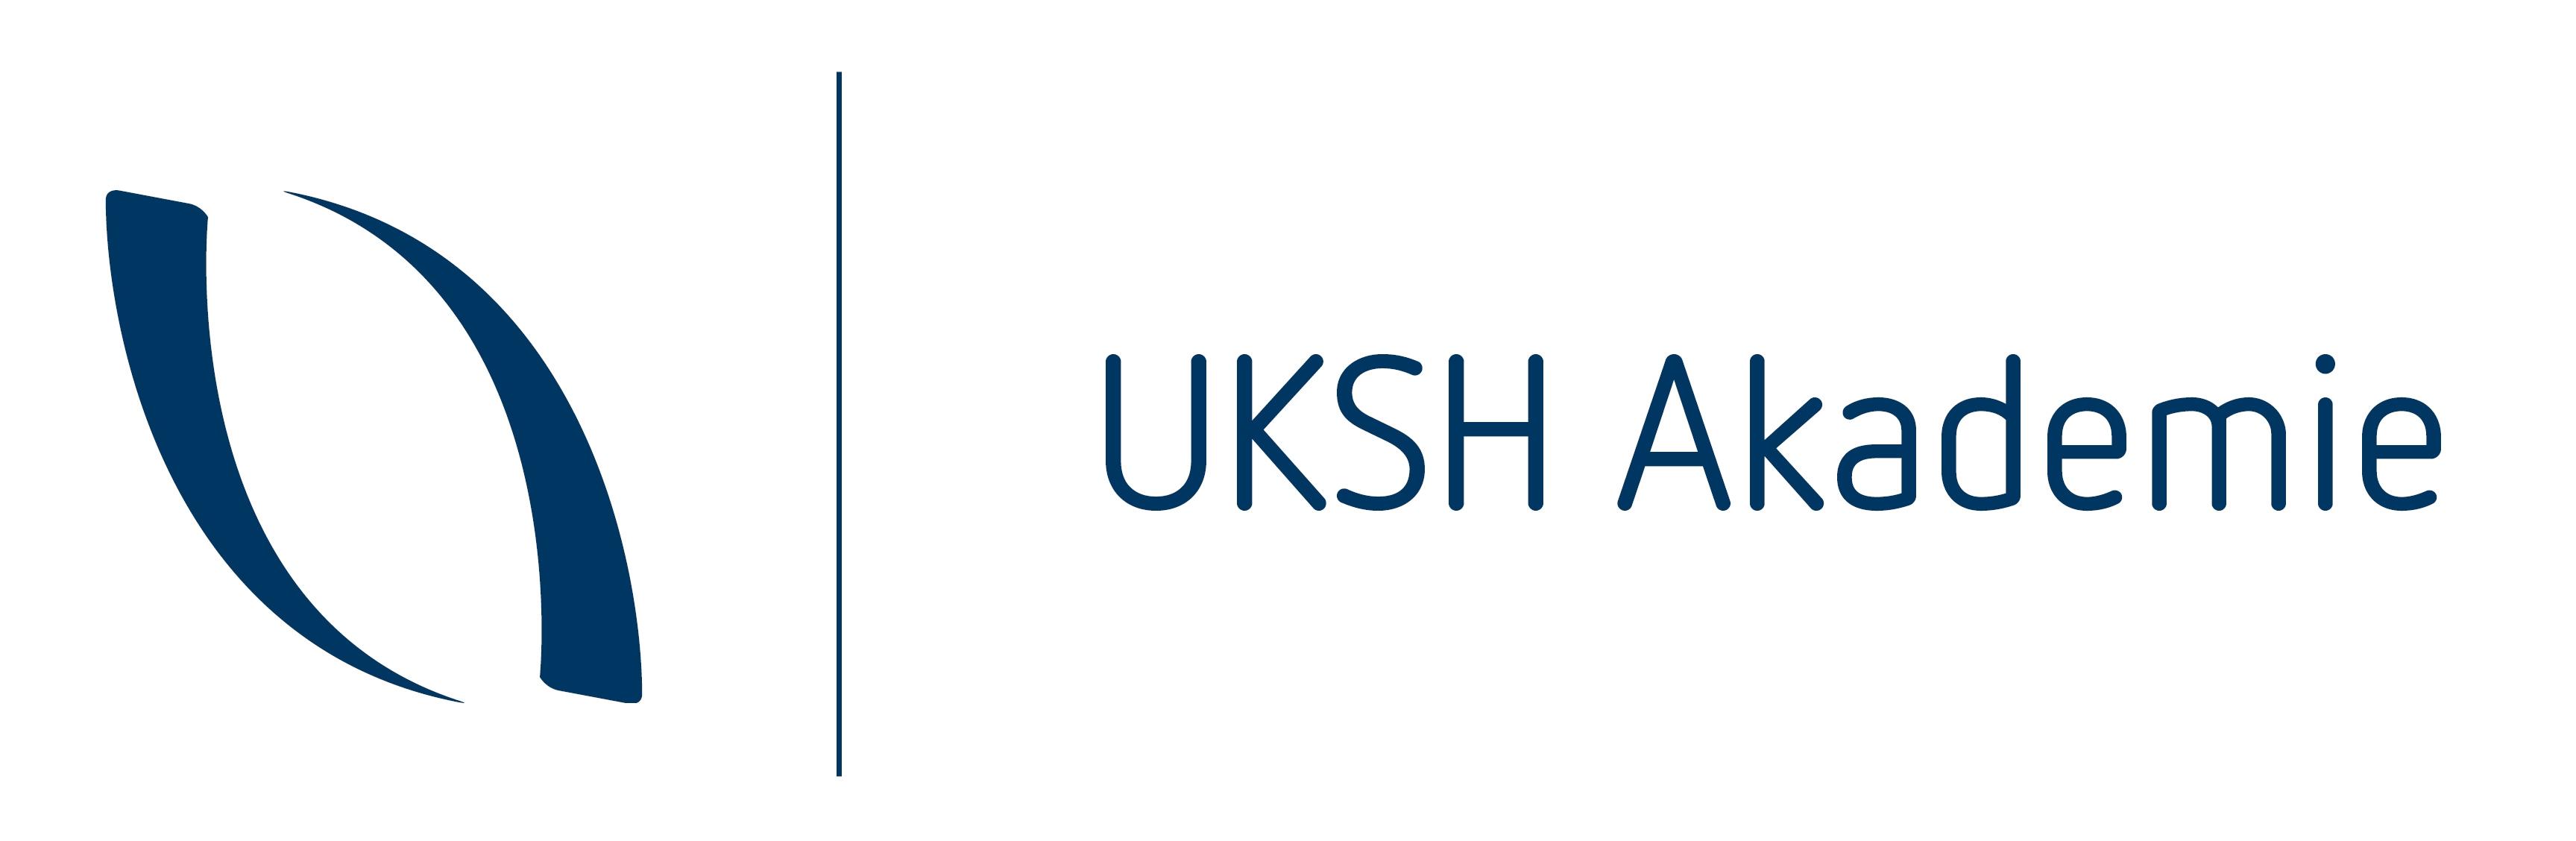 UKSH Akademie gemeinnützige GmbH